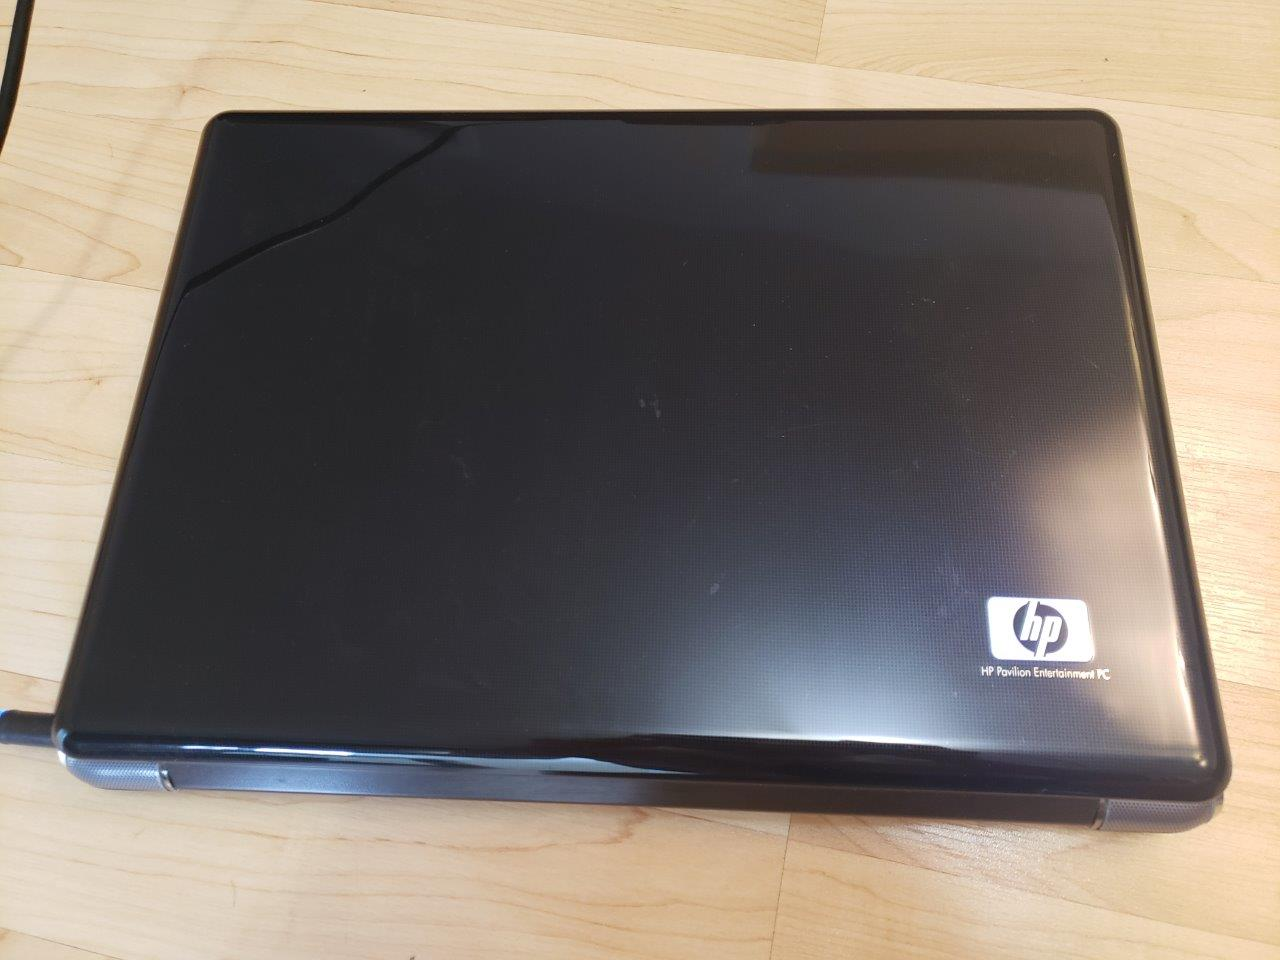 HP Pavilion DV5 1002NR HALF TOP 15.4 inch WXGA GLOSSY LCD SCREEN + WebCam, BLACK